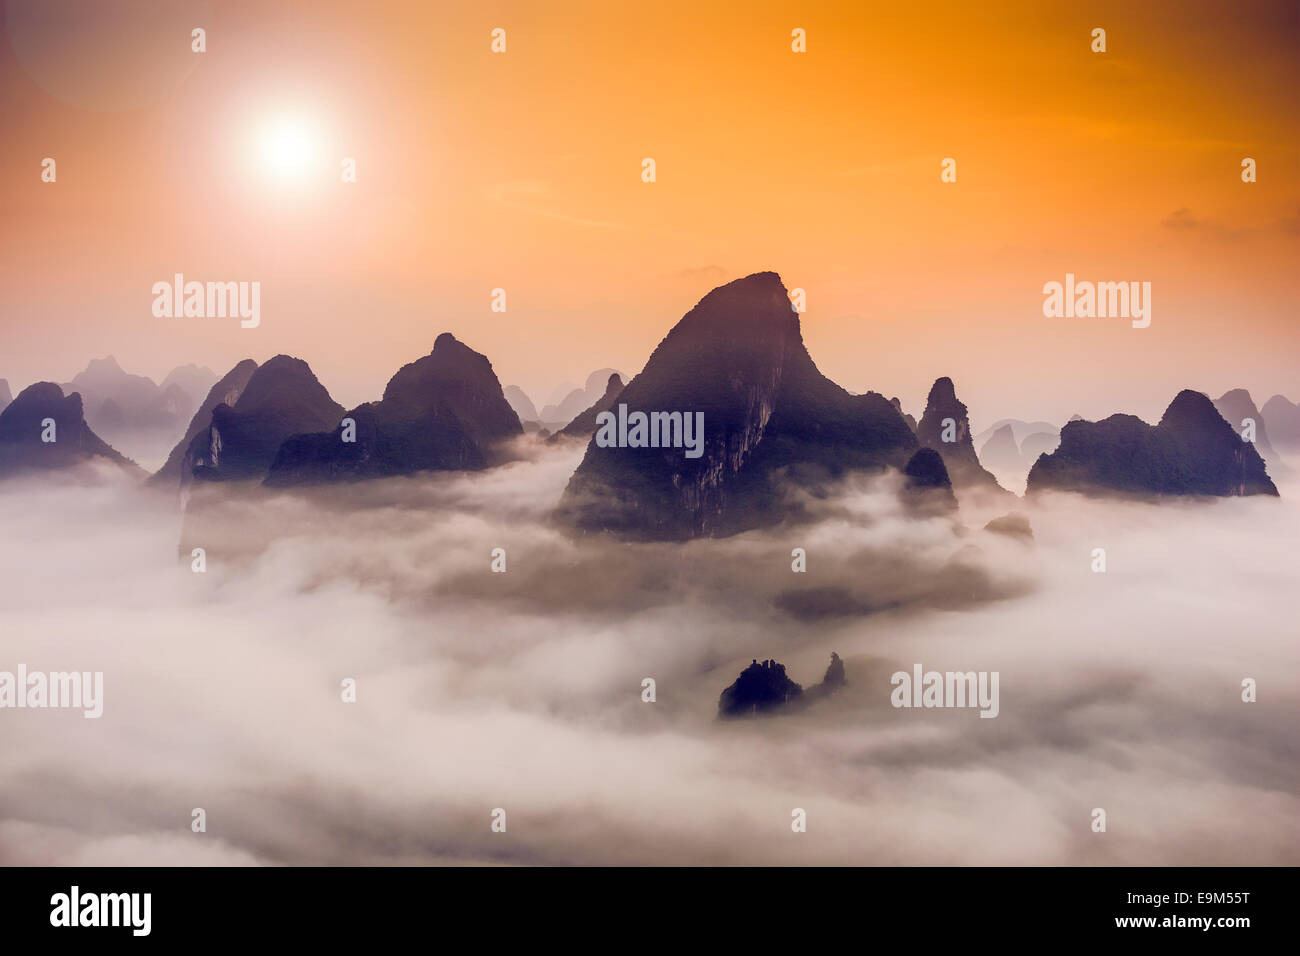 Montañas Karst de Xingping, China. Imagen De Stock